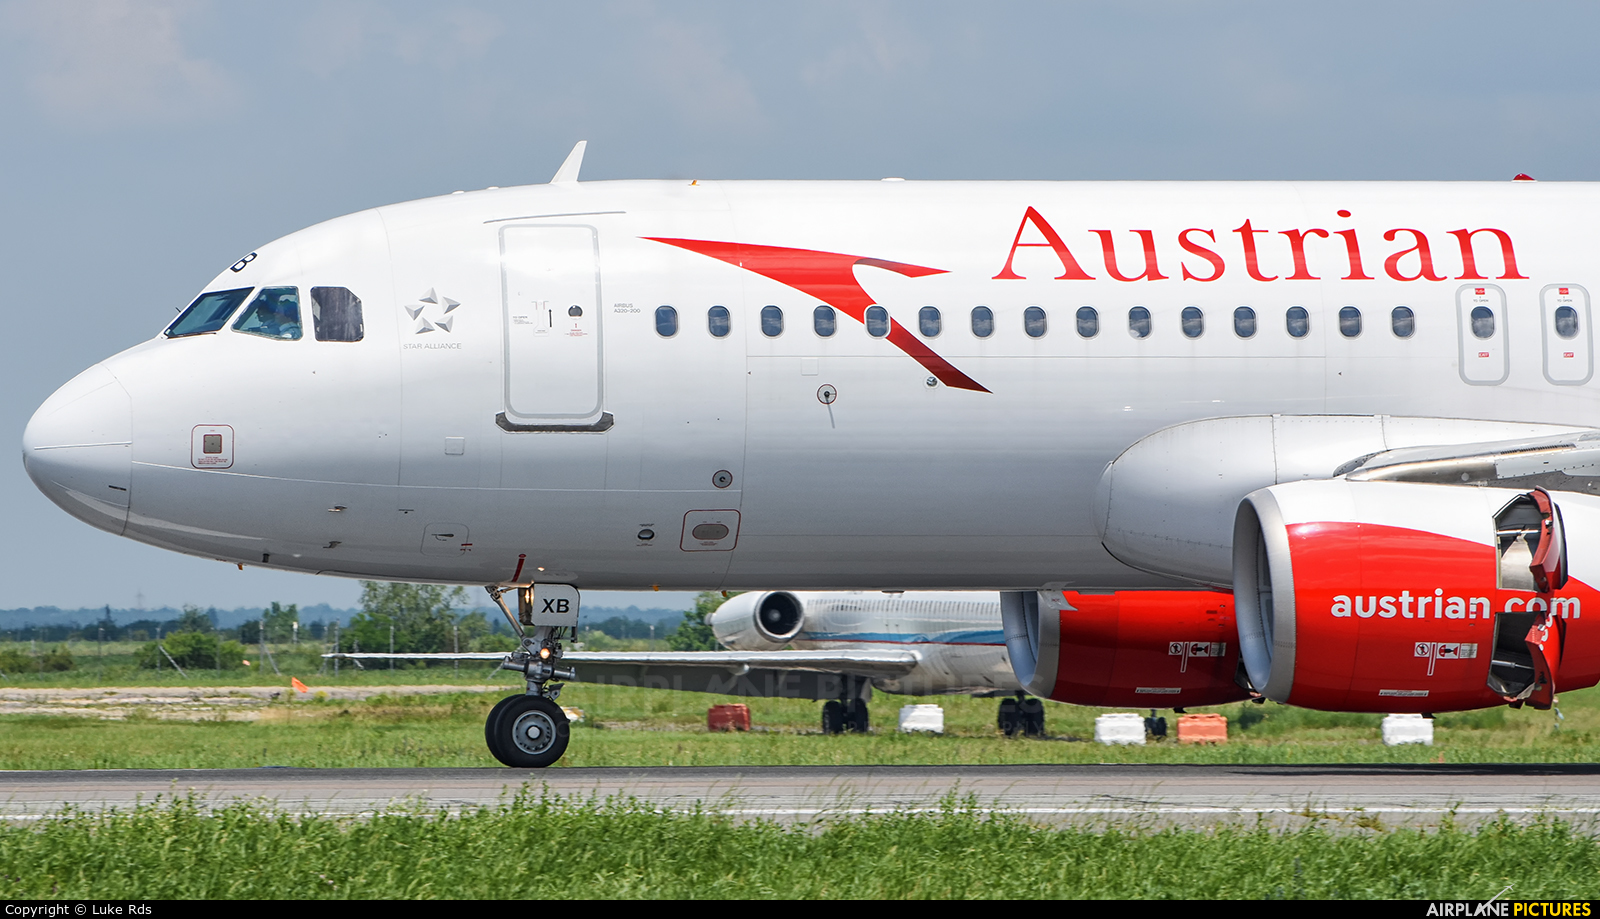 Austrian Airlines/Arrows/Tyrolean OE-LXB aircraft at Bucharest - Henri Coandă